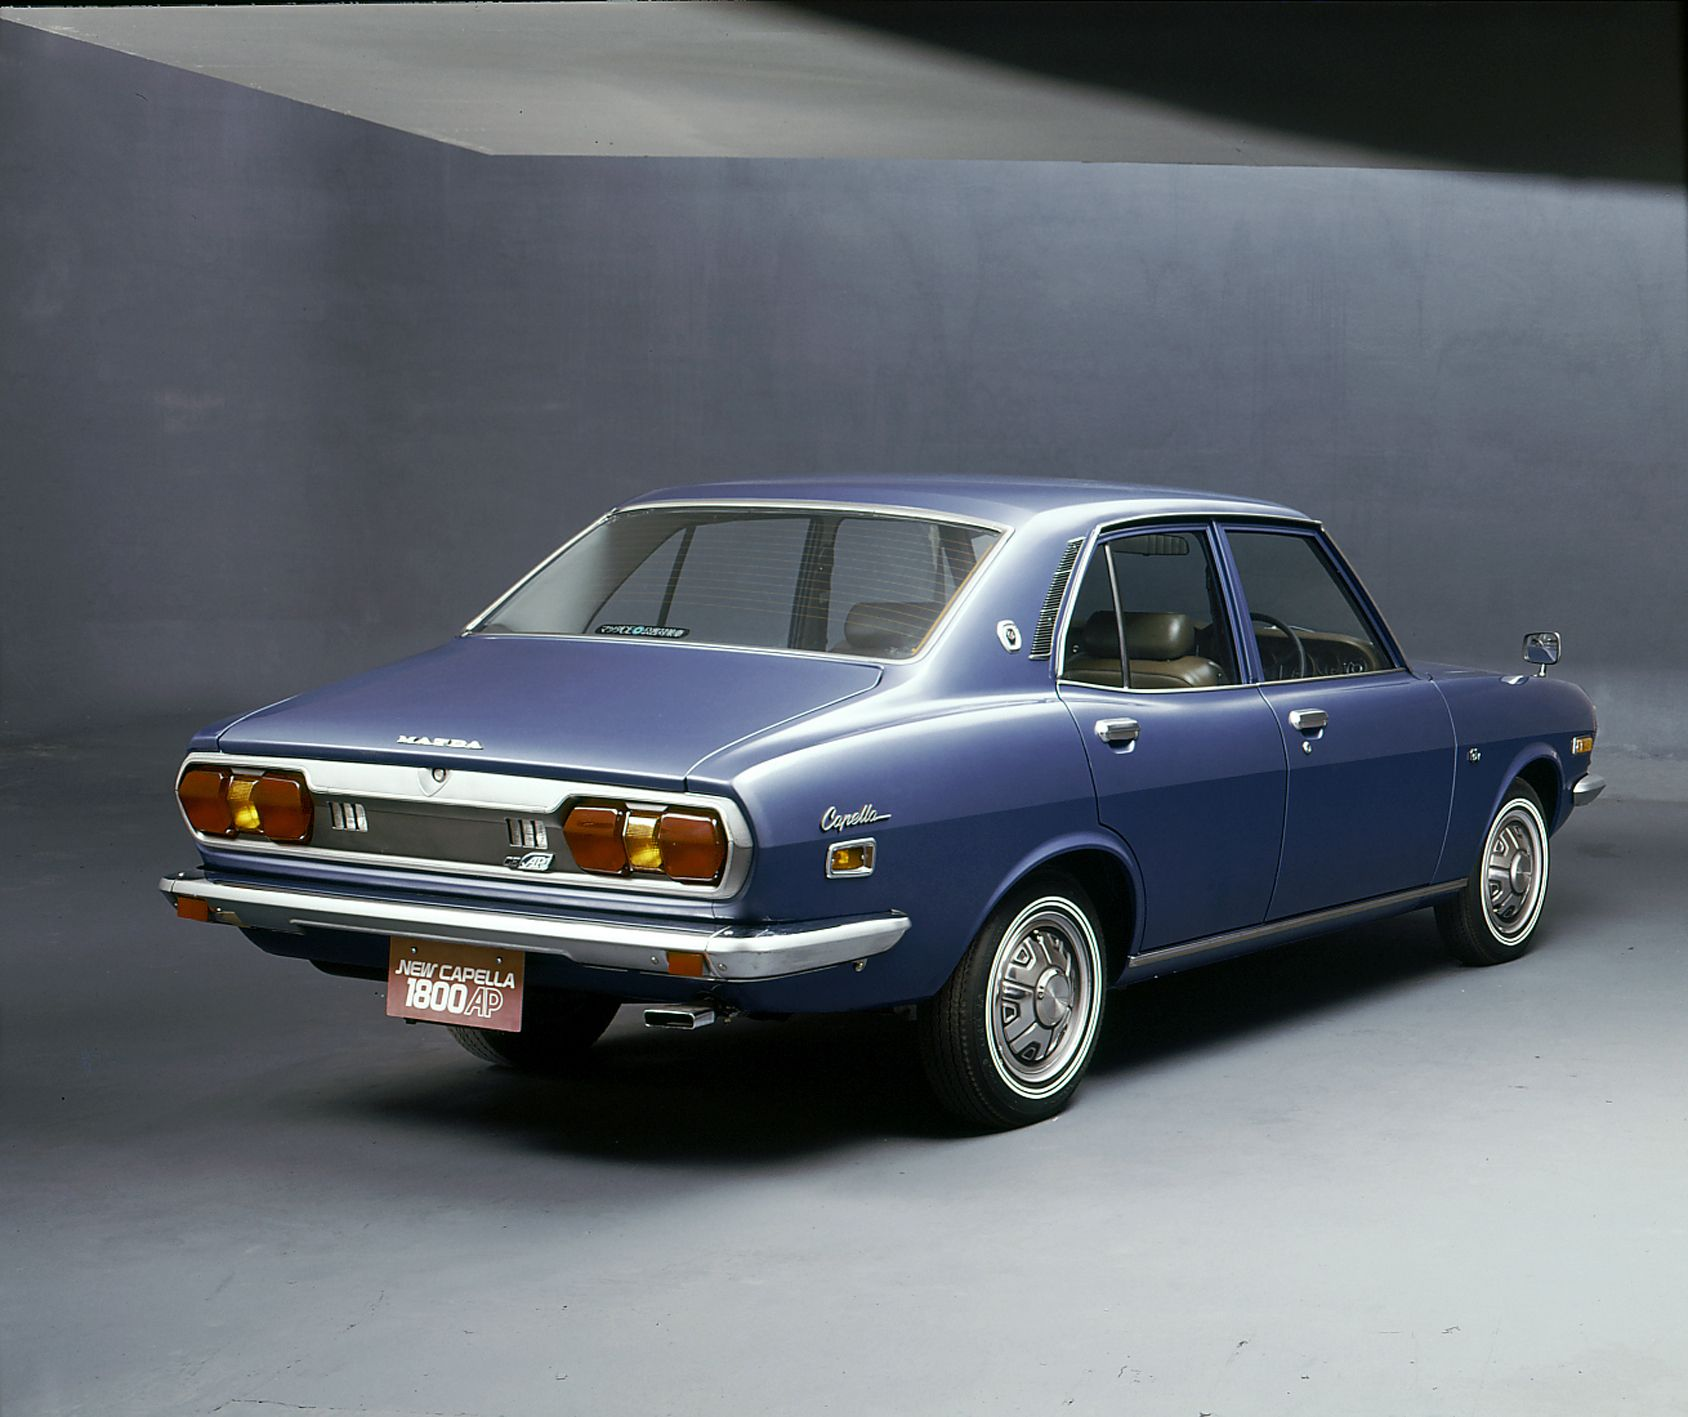 1976 Mazda New Capella 800 マツダ, 旧車, 自動車